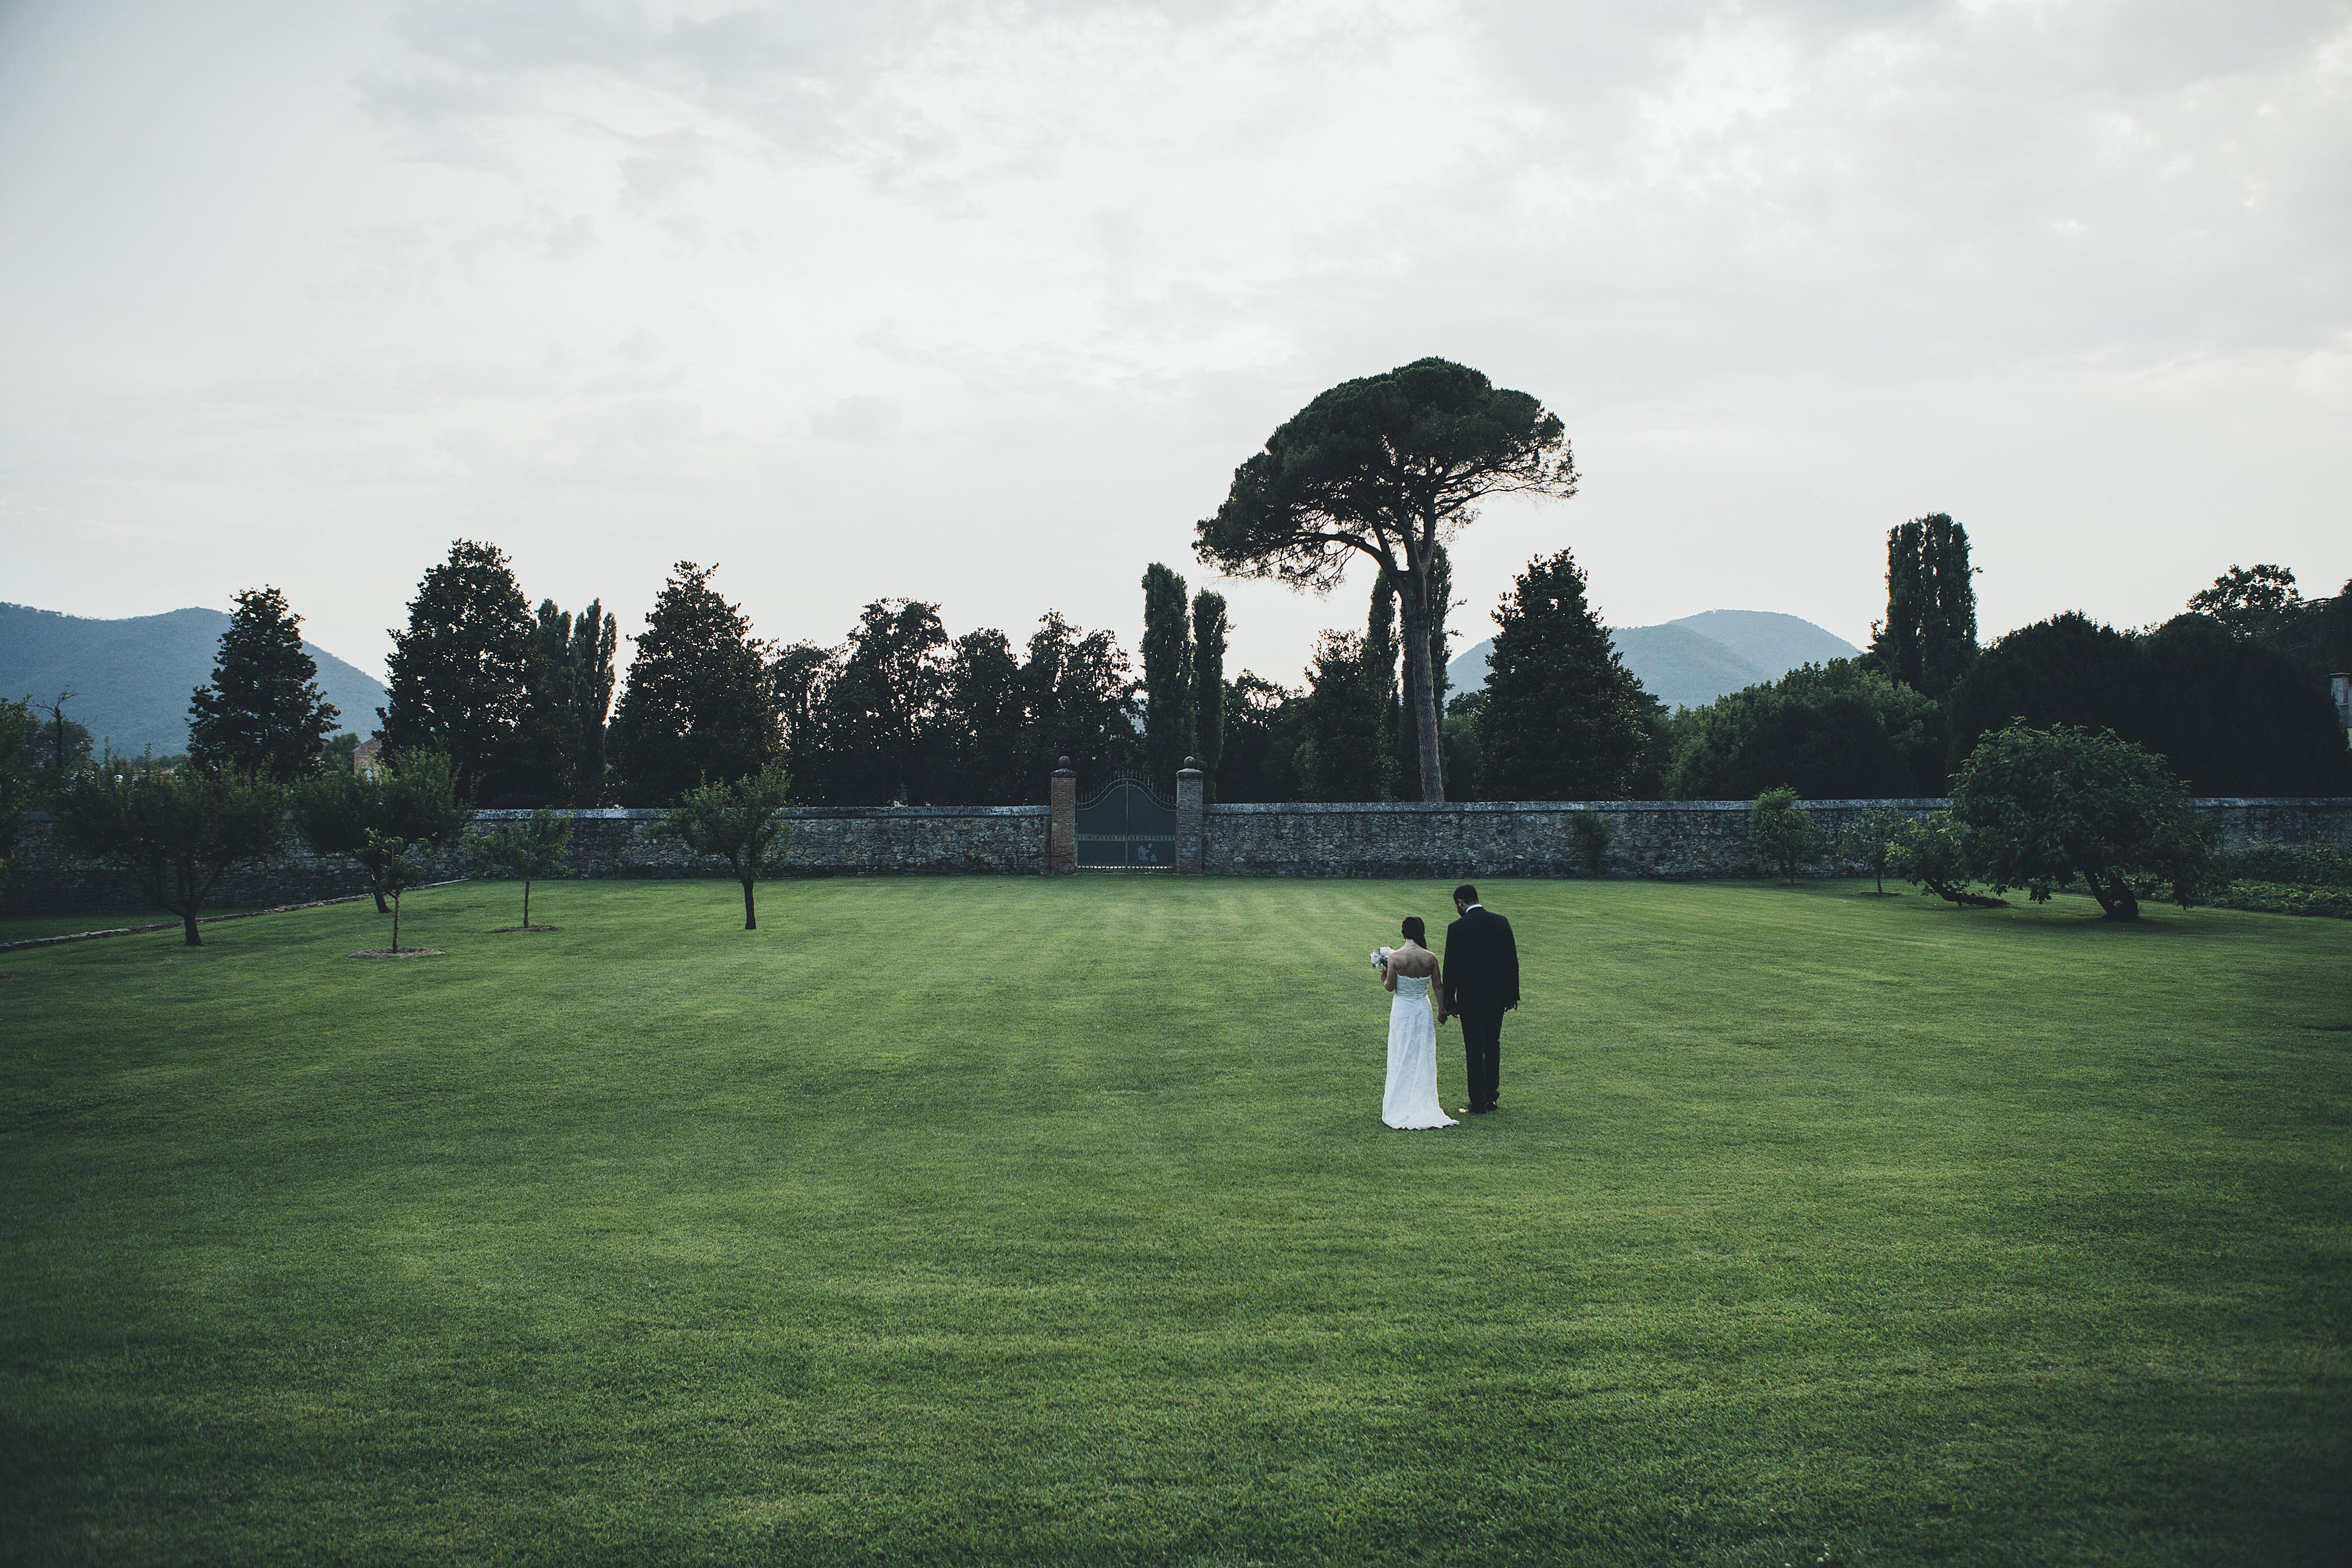 DANIELAeALBERTO wedding castello di lispida